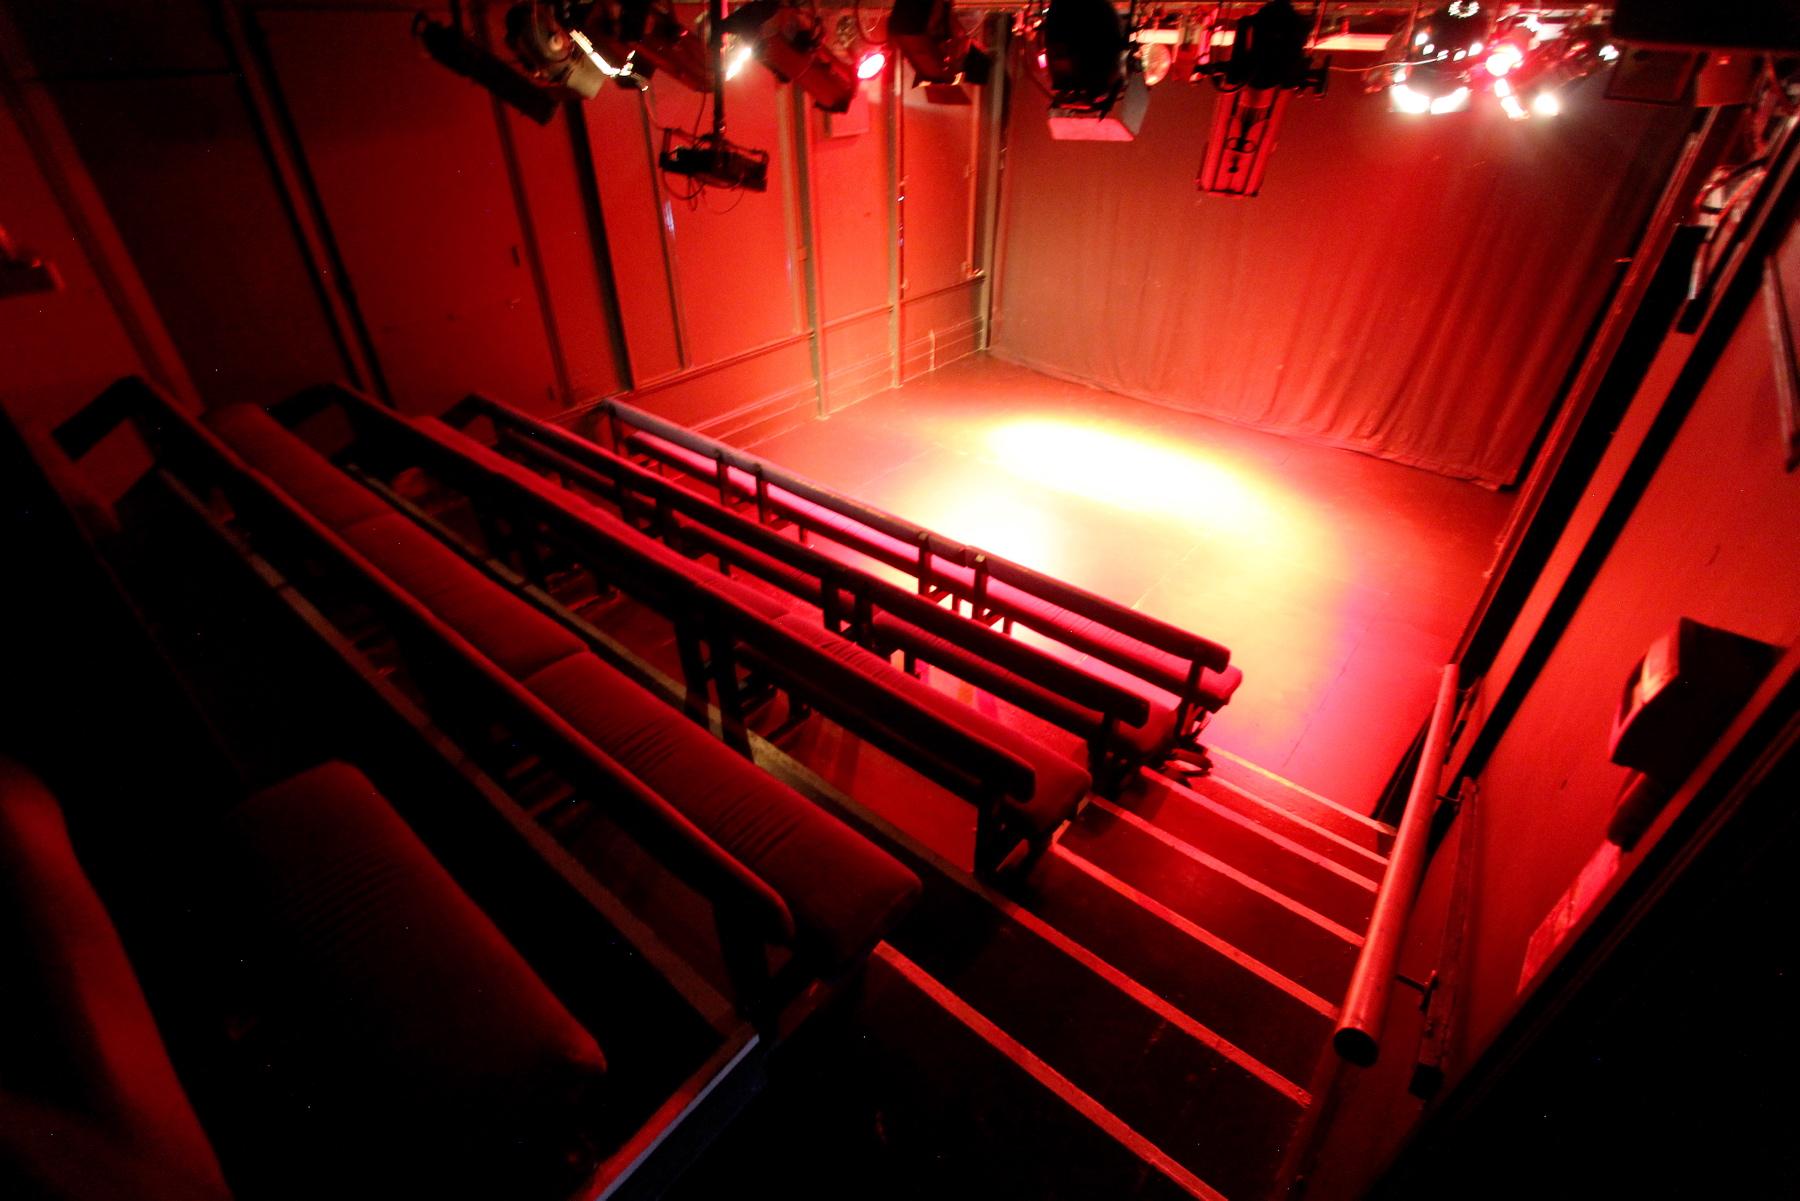 The Etcetera Theatre, Camden   ©Robert Piwko/Etcetera Theatre